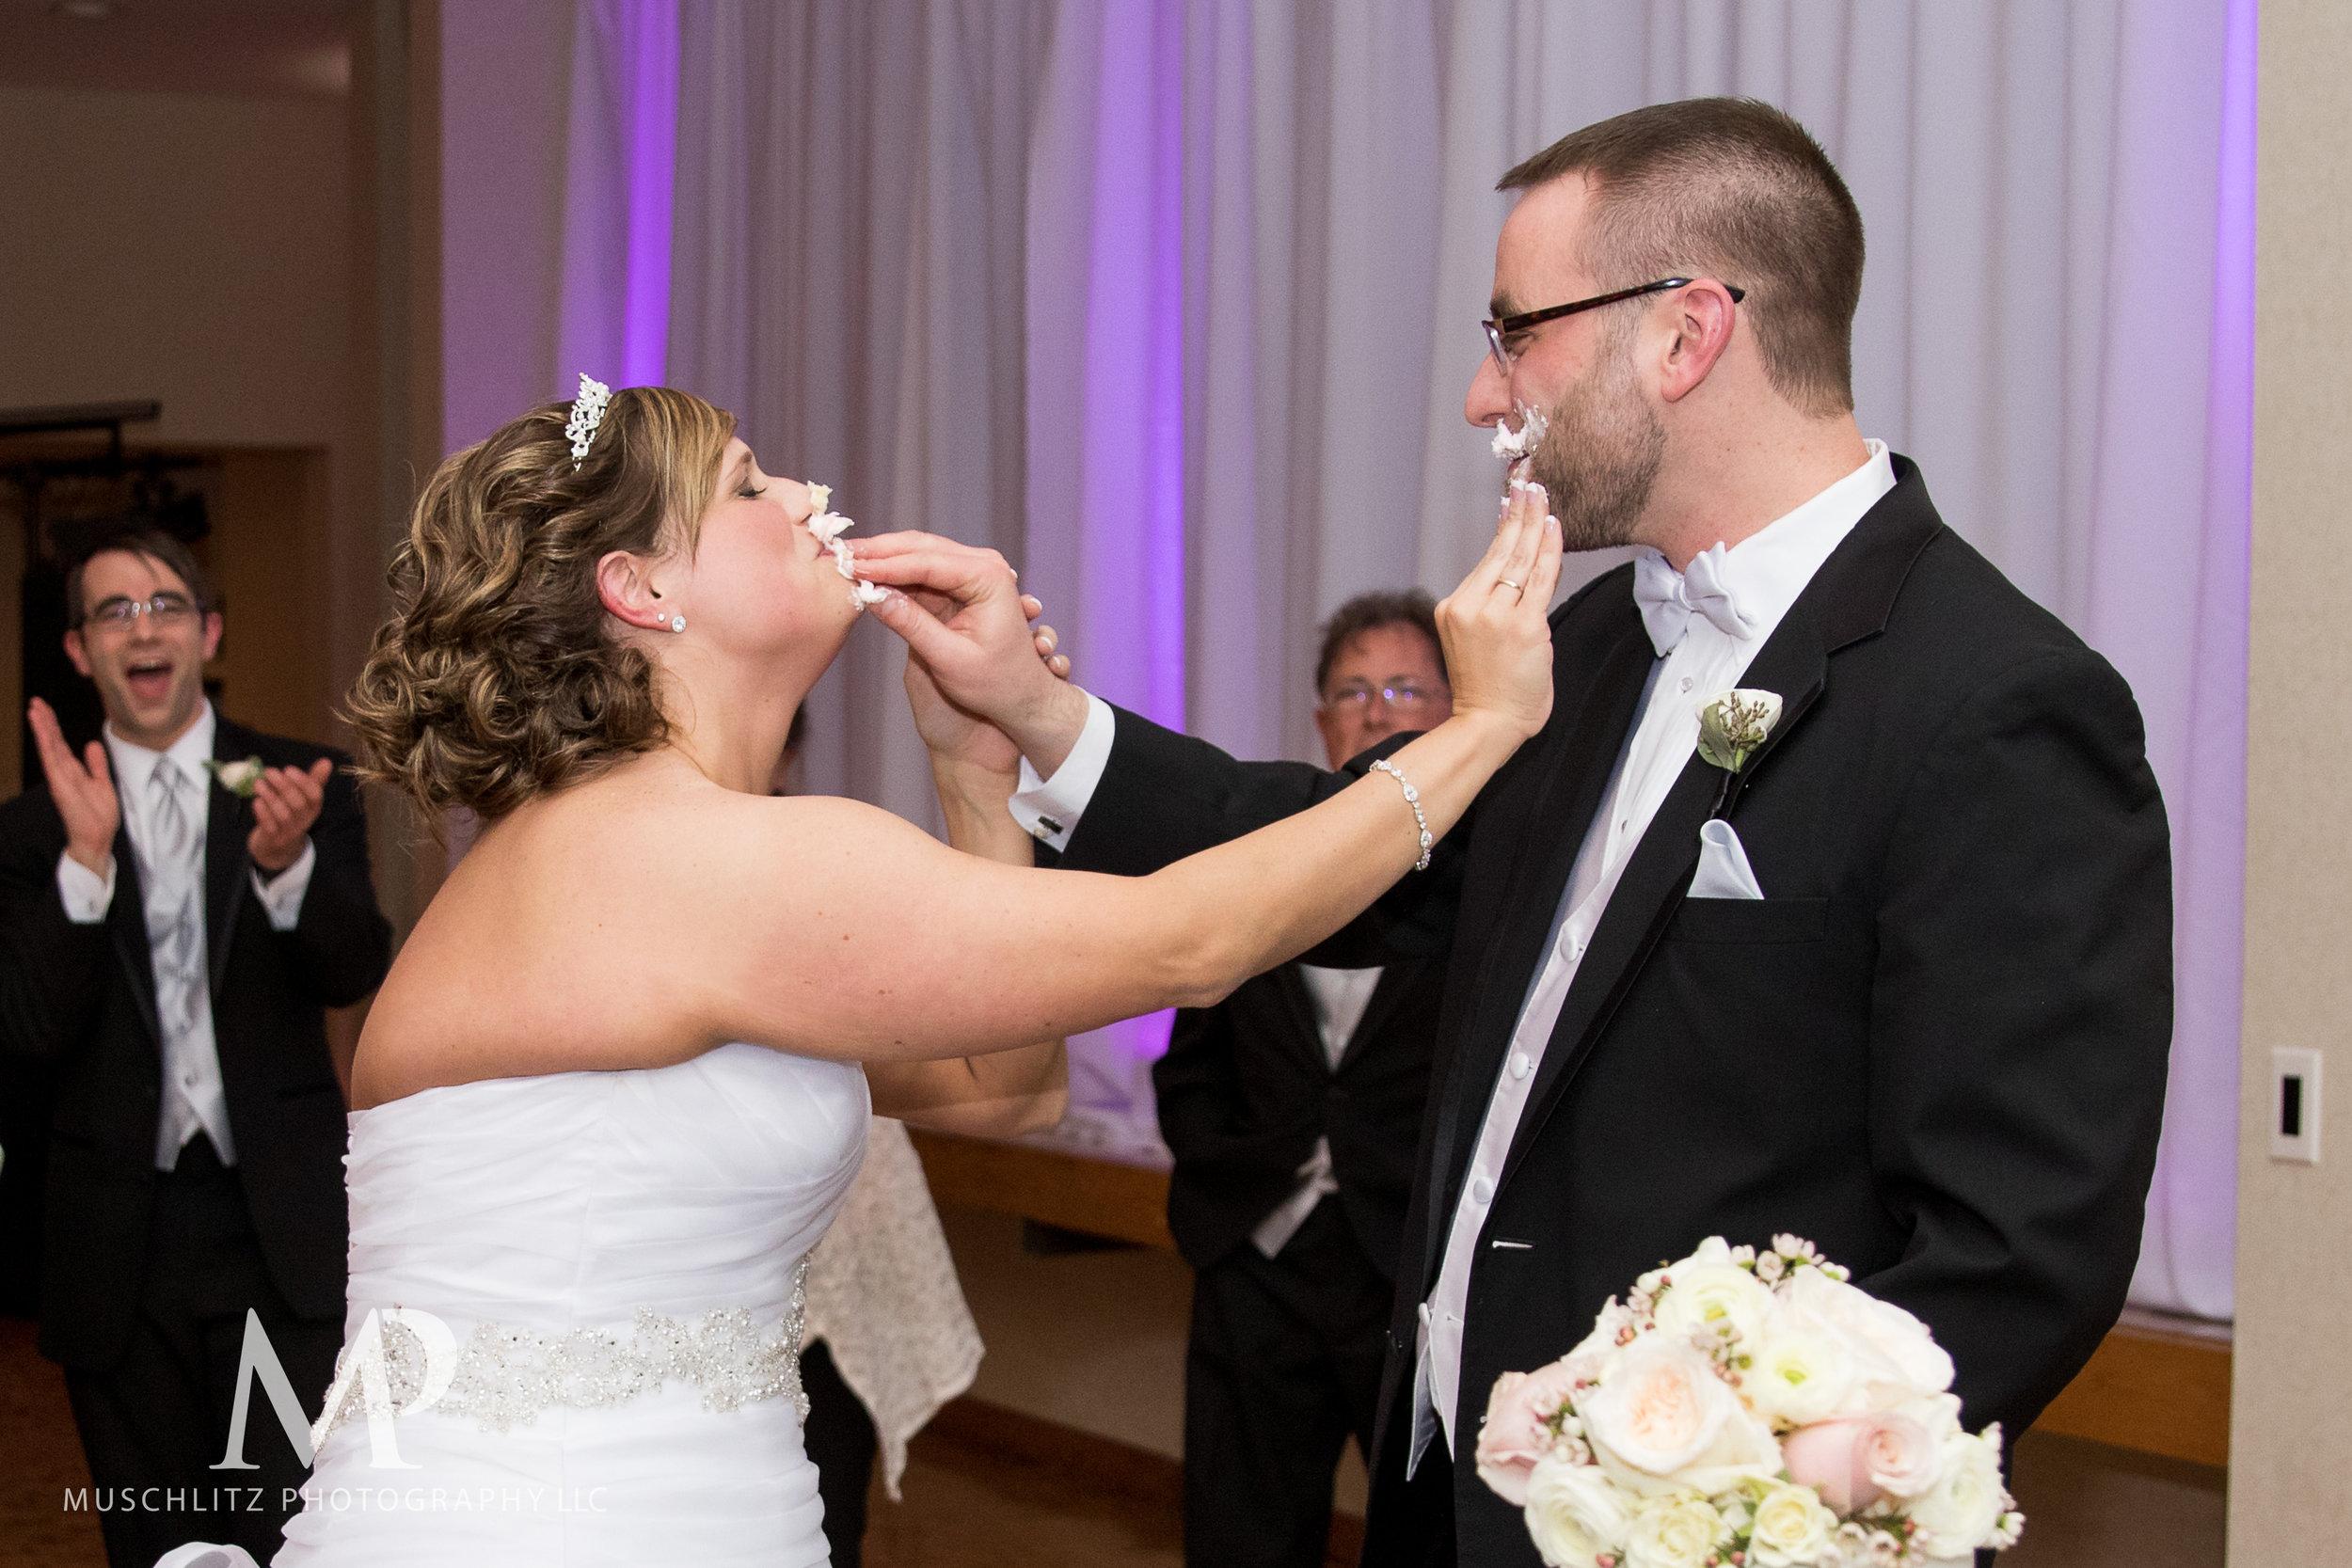 annunciation-banquet-conference-center-downtown-columbus-wedding-reception-downtown-columbus-ohio-muschlitz-photography-014.JPG